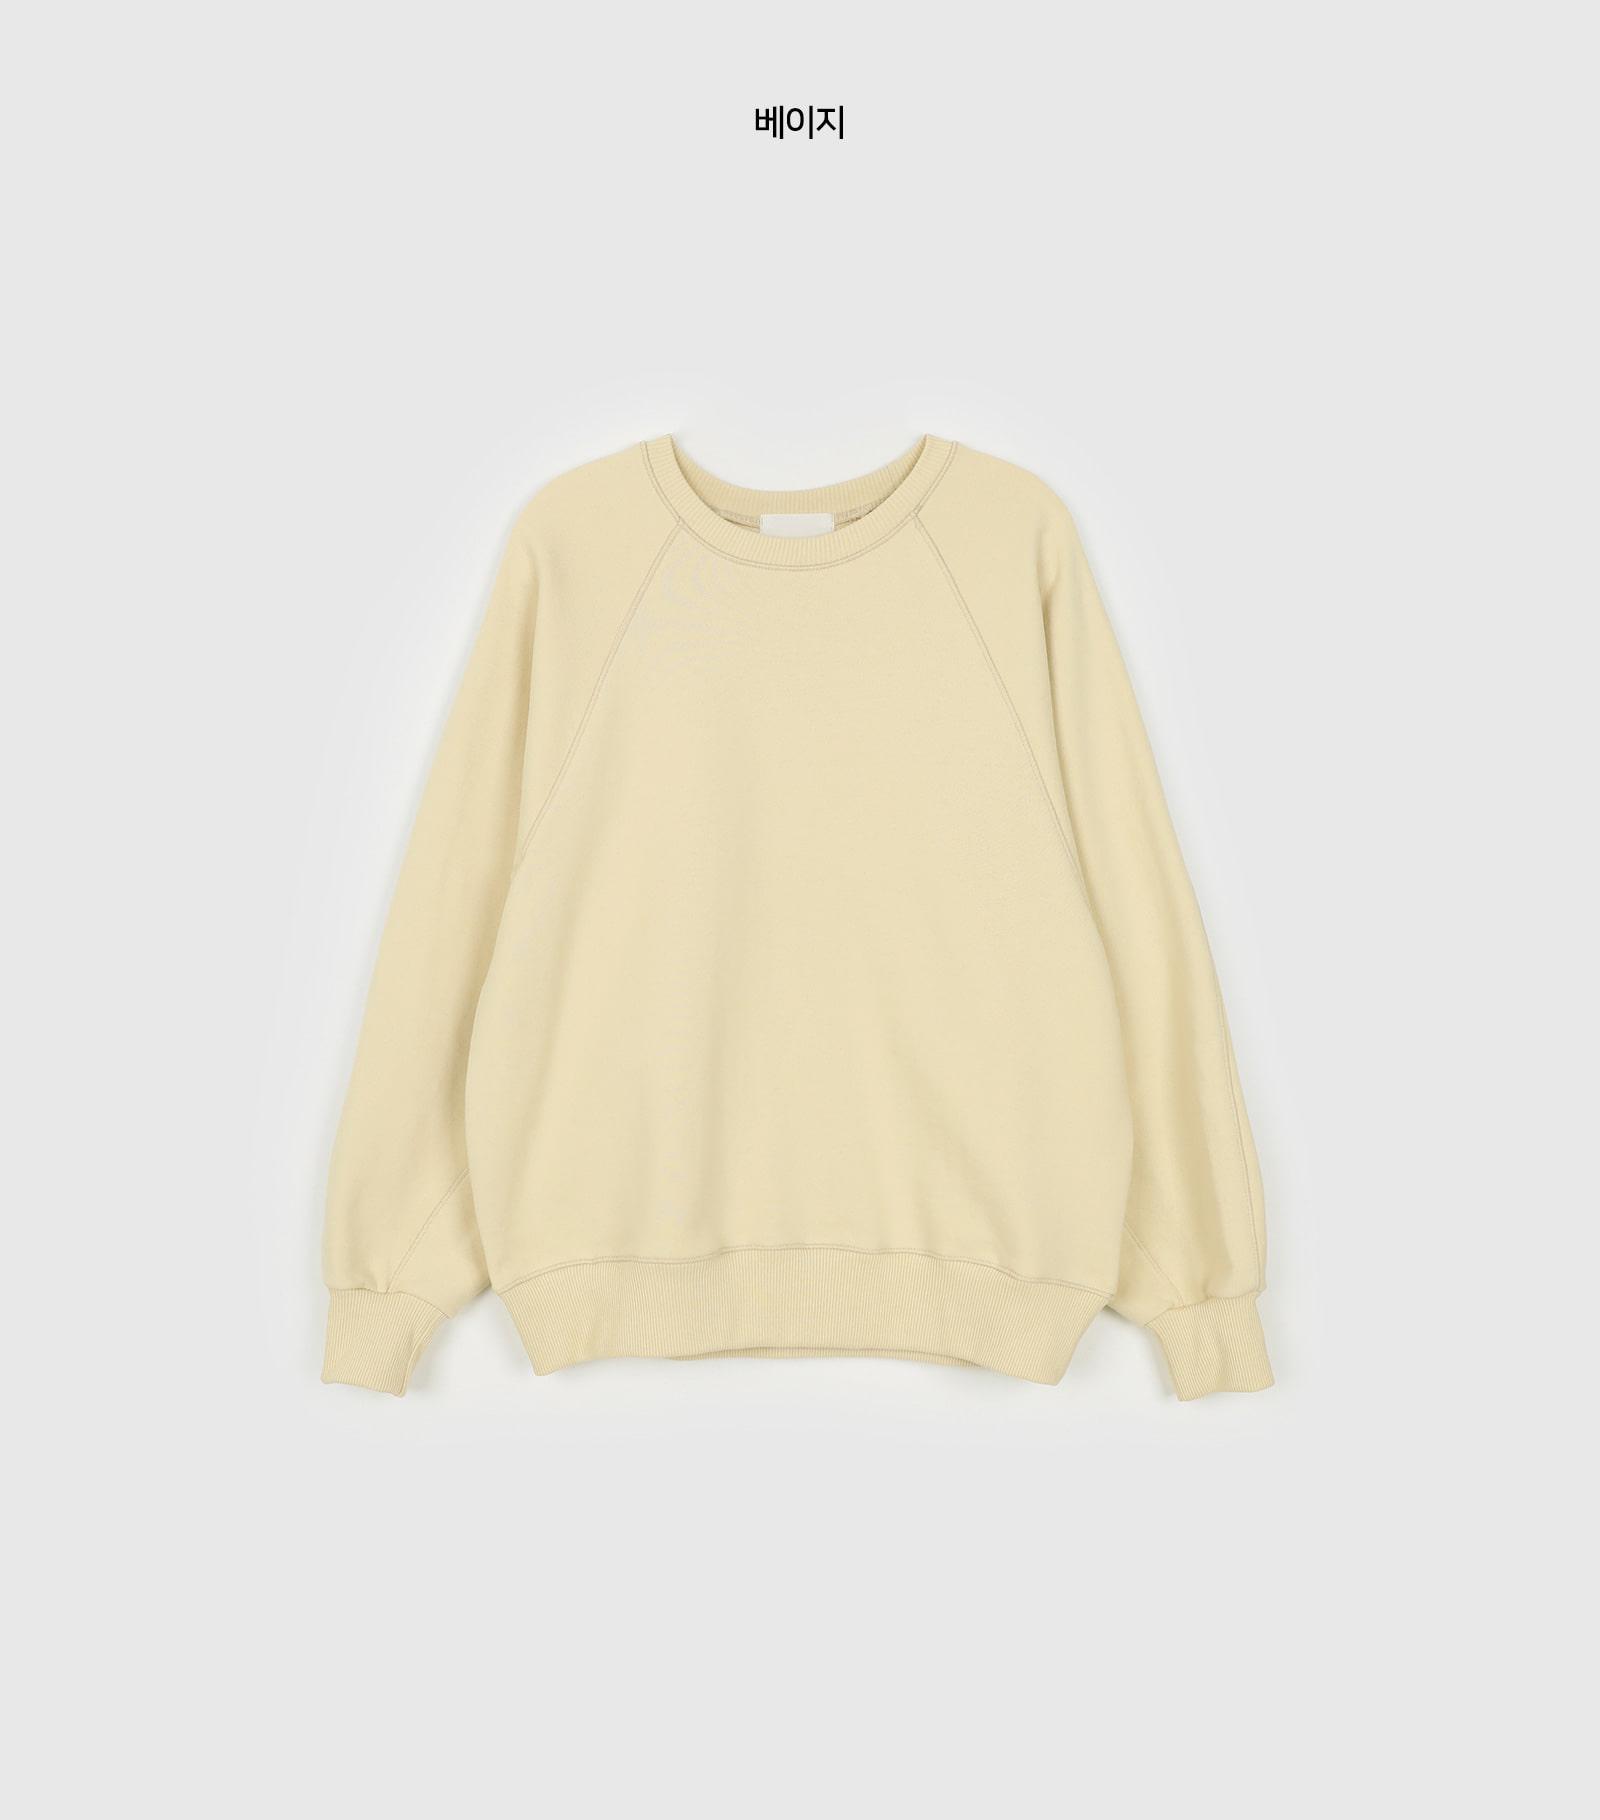 Nagrand Standard One-to-One Sweatshirt